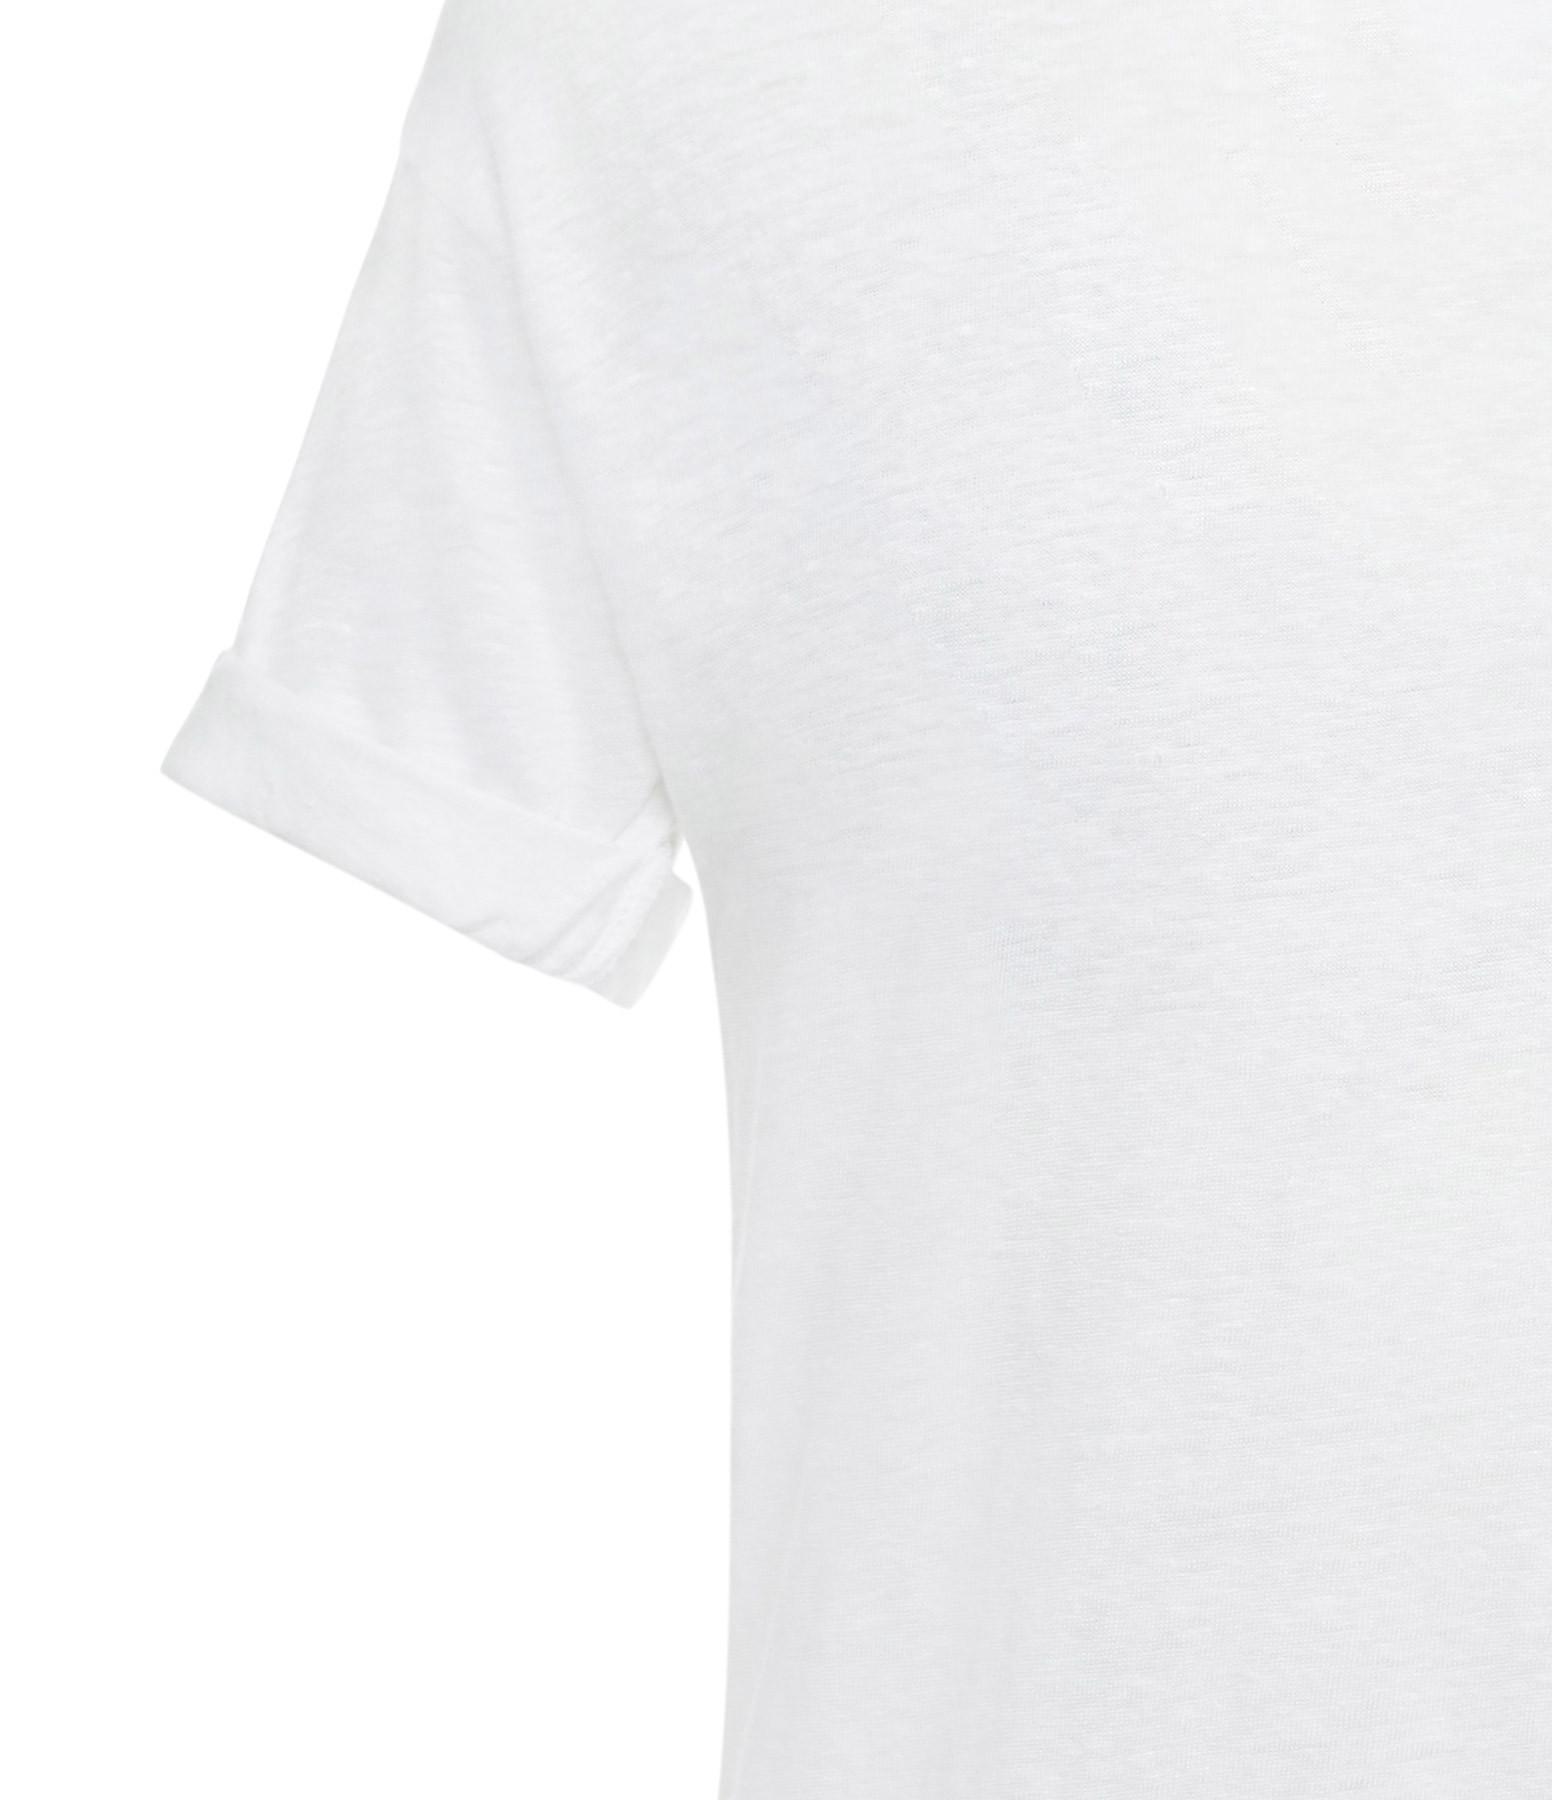 ISABEL MARANT ÉTOILE - Tee-shirt Koldi Lin Blanc